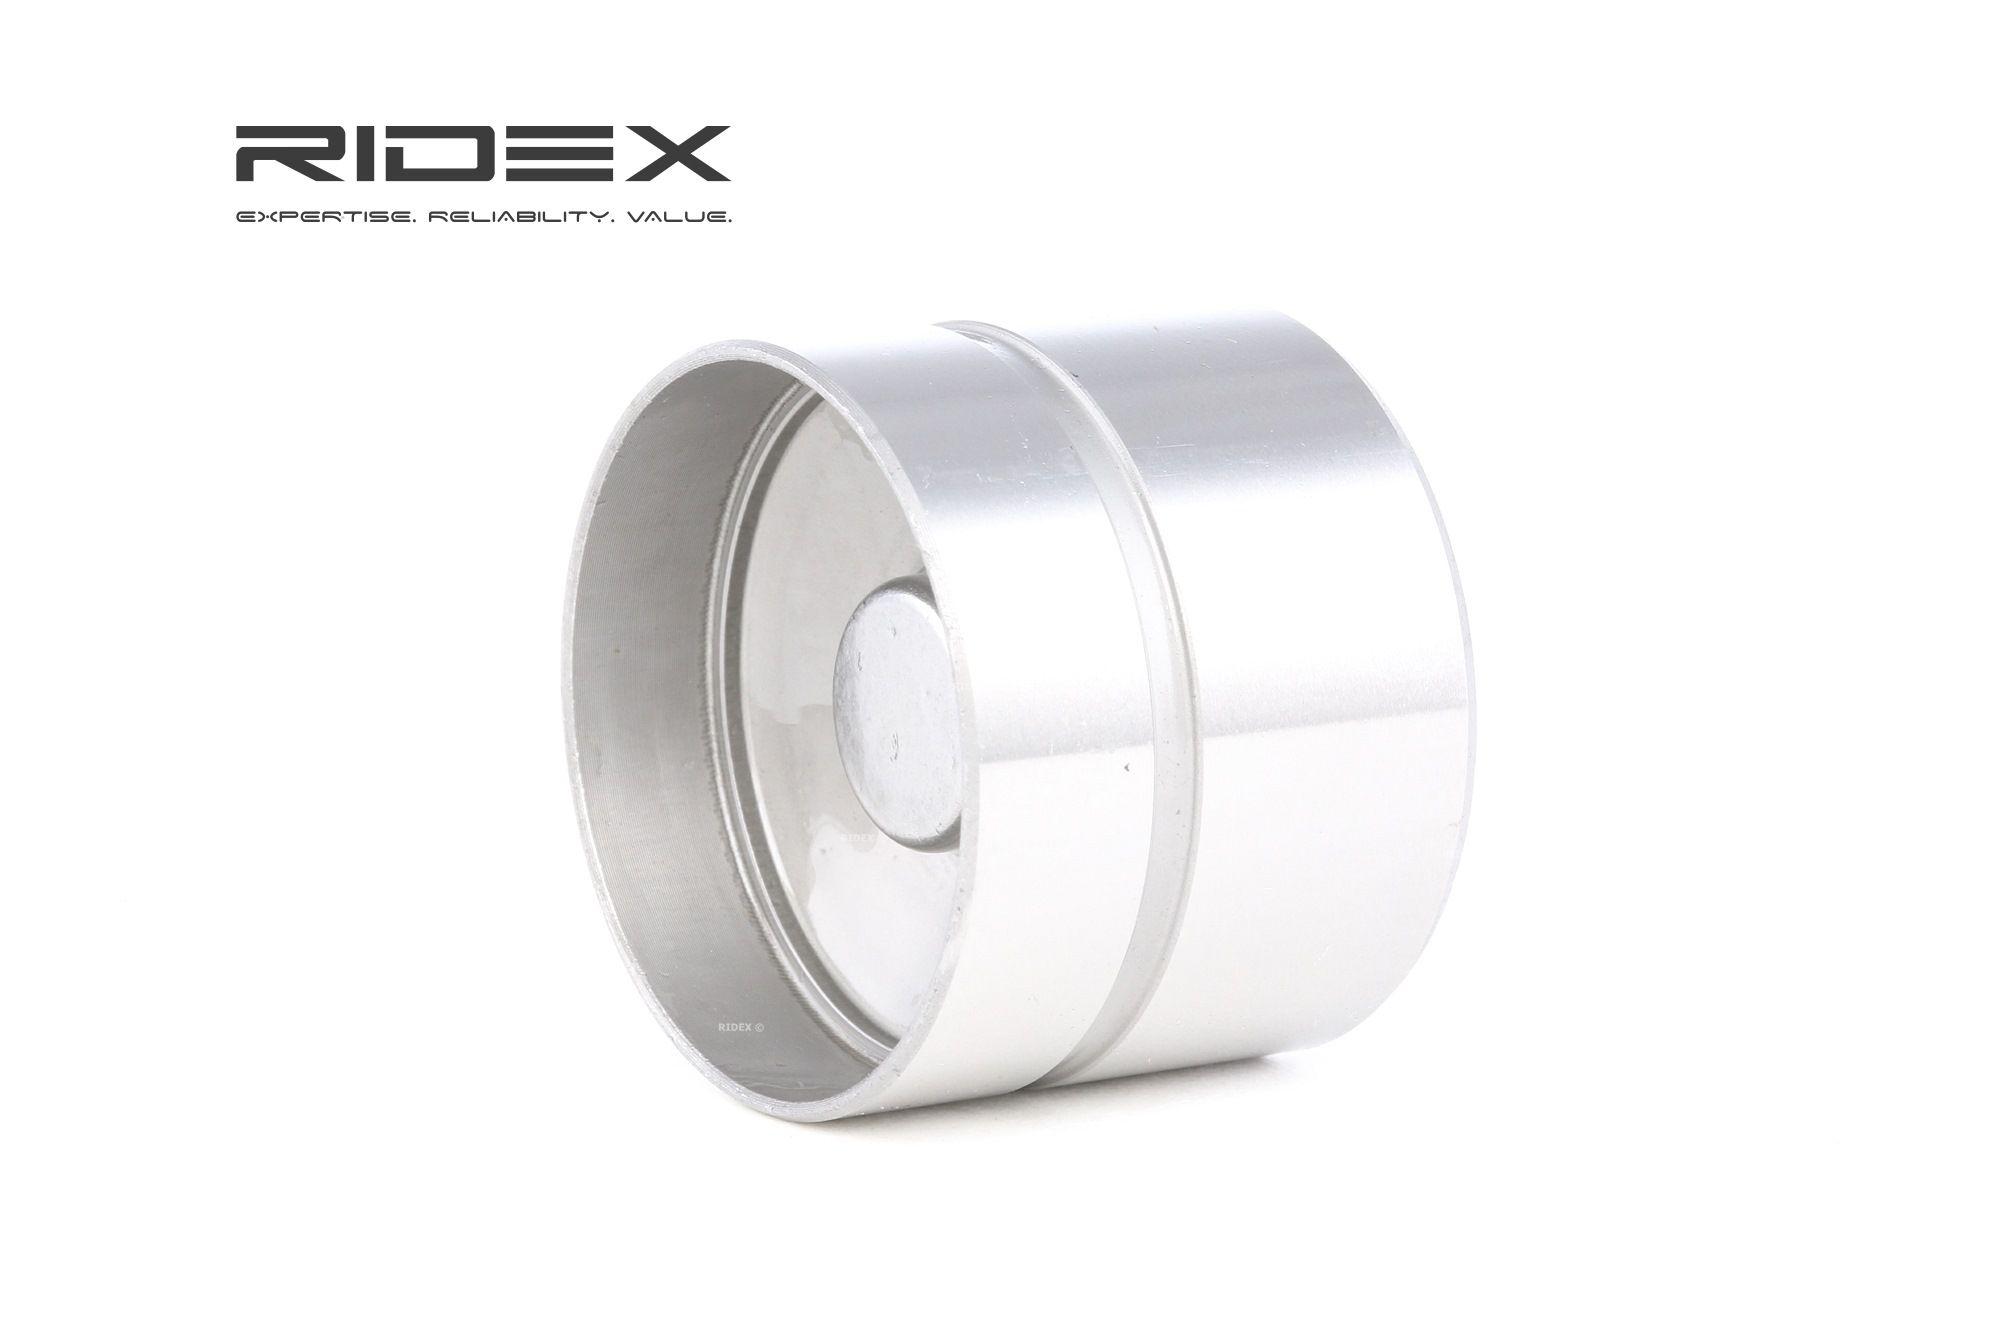 Stößel RIDEX 1216R0046 Bewertung